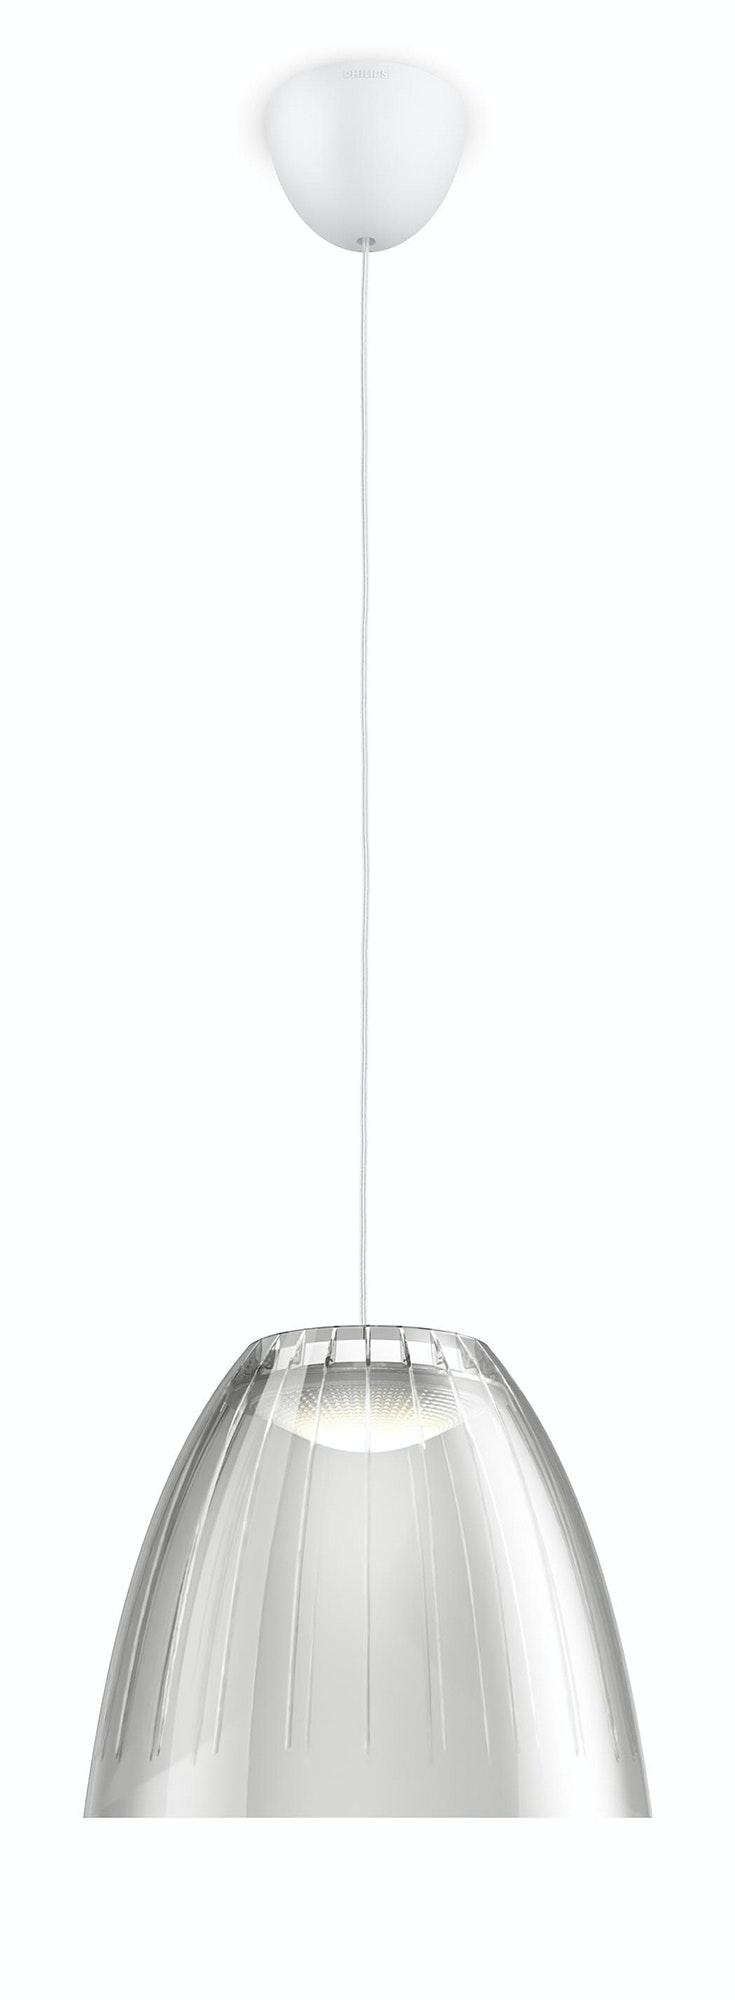 Pendel Philips Tenuto grå 1x4.5W 230V